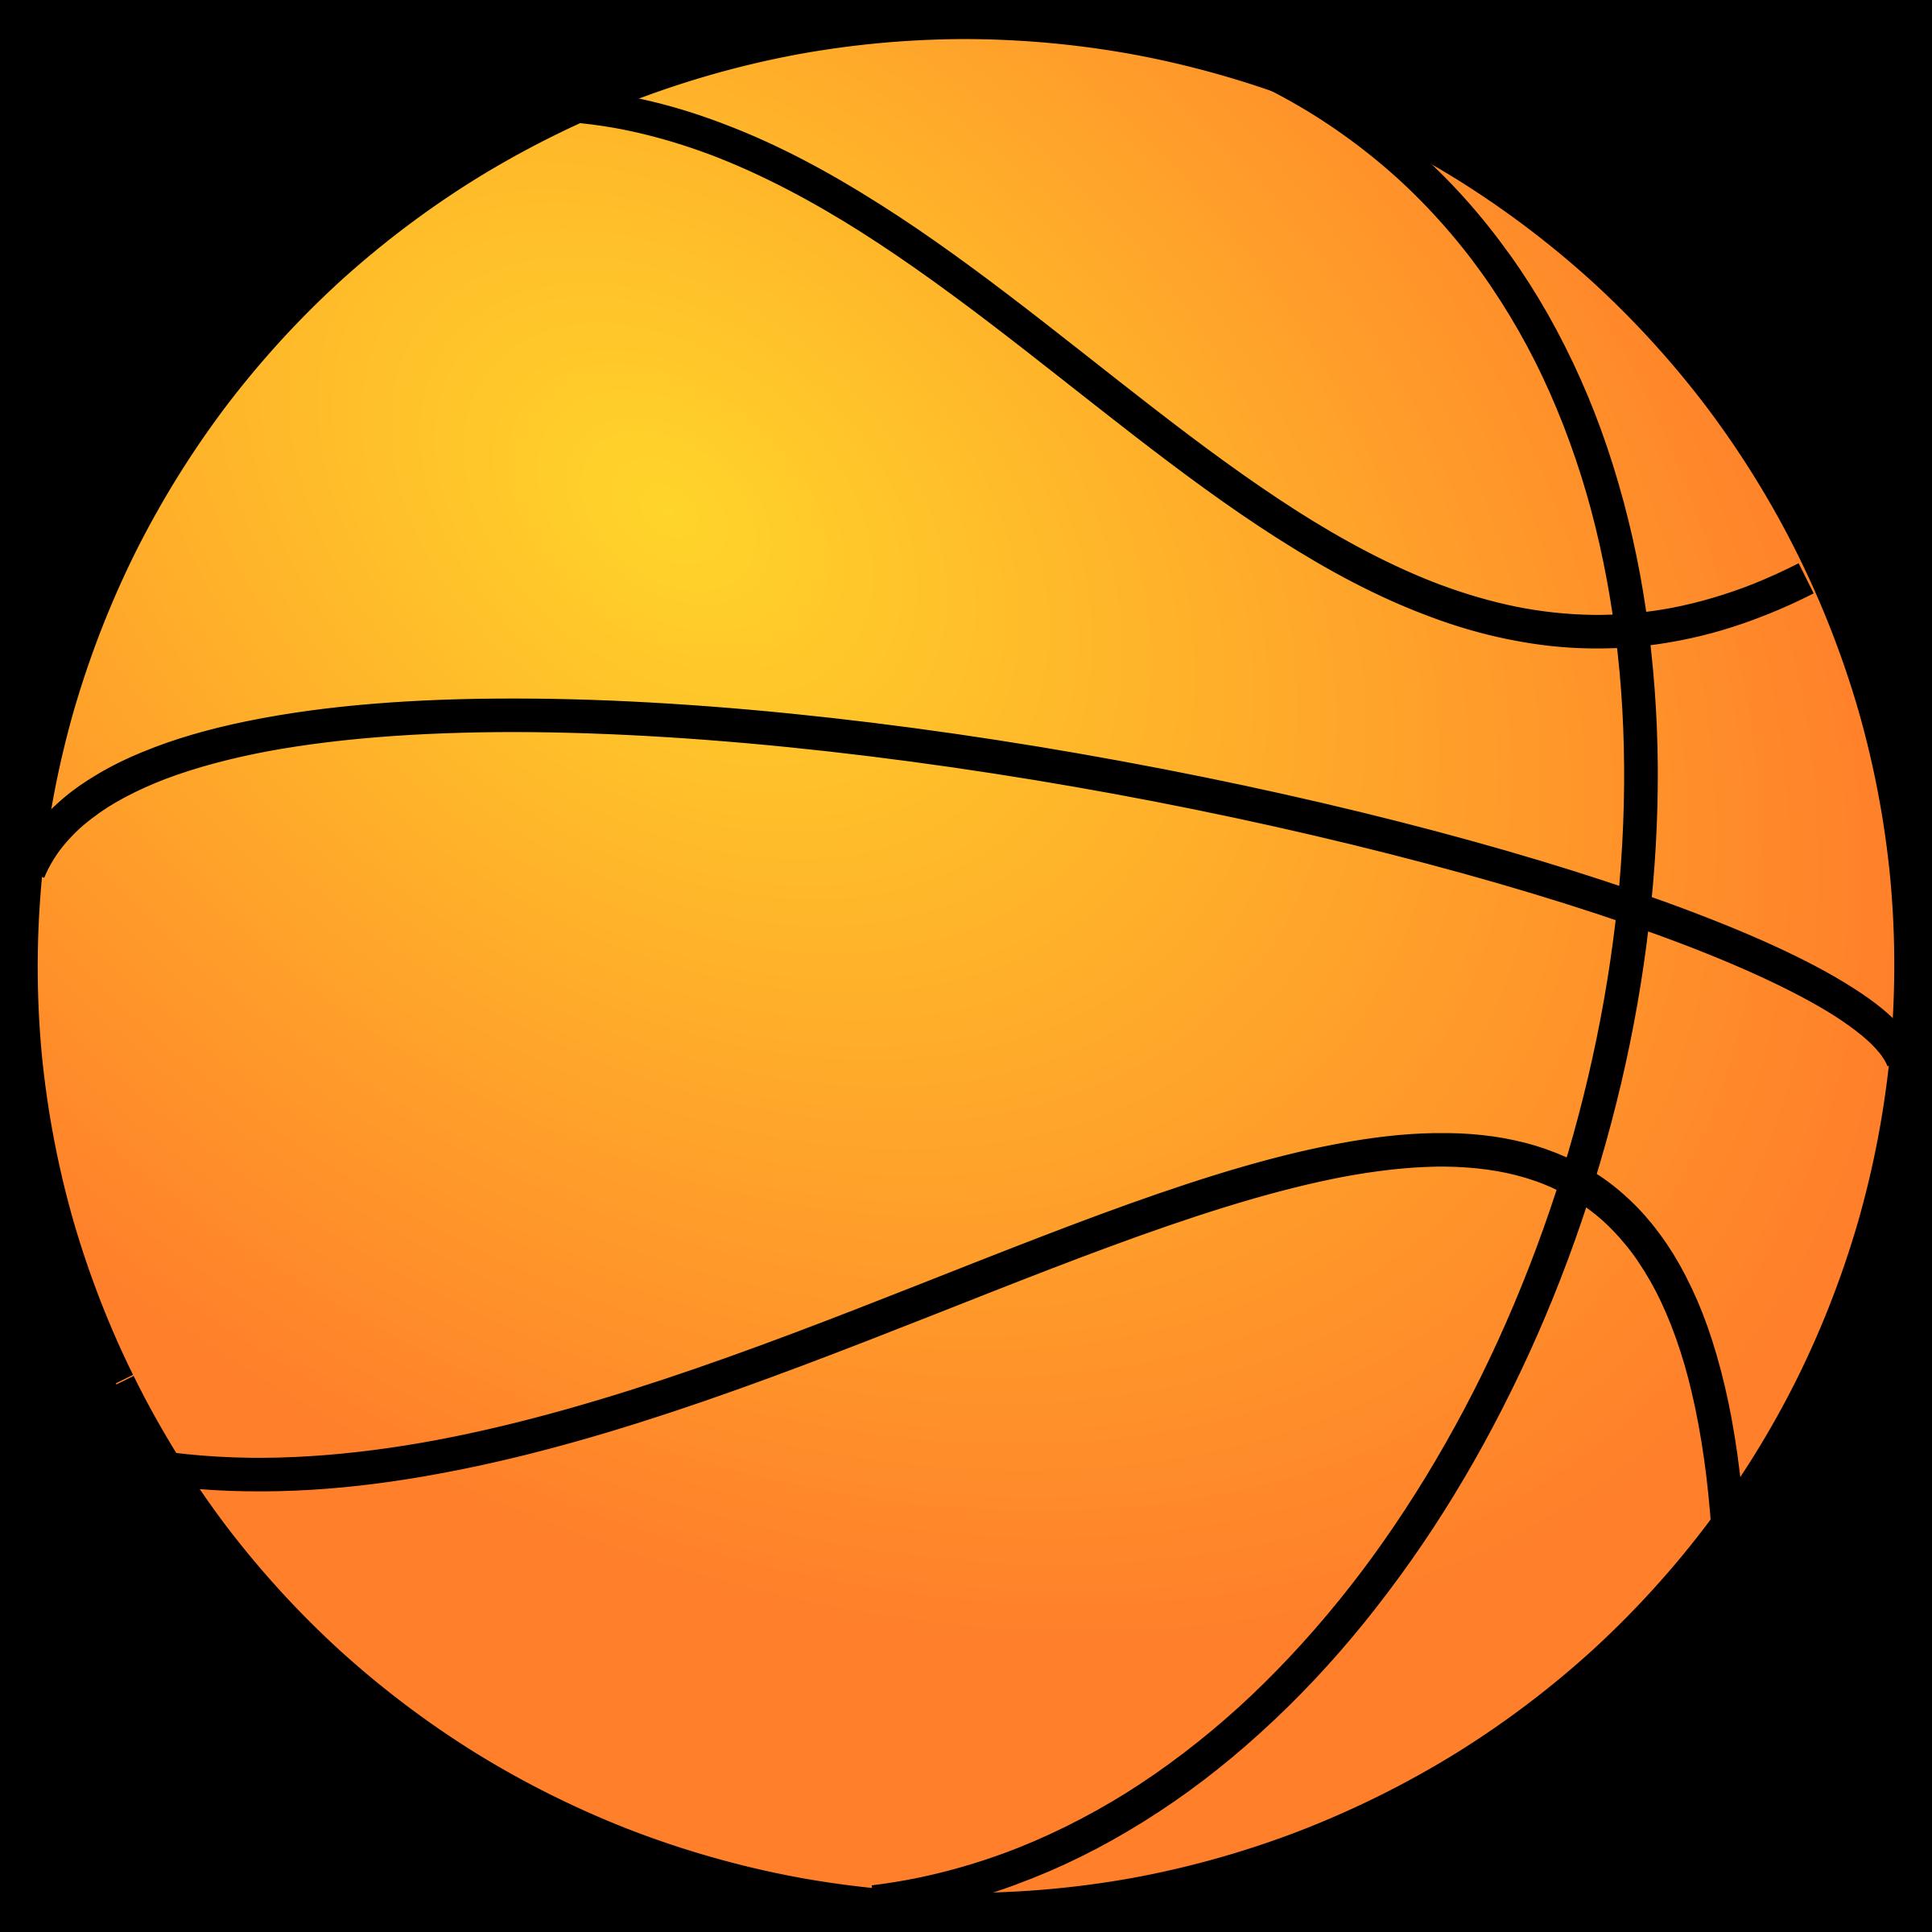 pin Wallpaper clipart basketball #11 - Basketball HD PNG